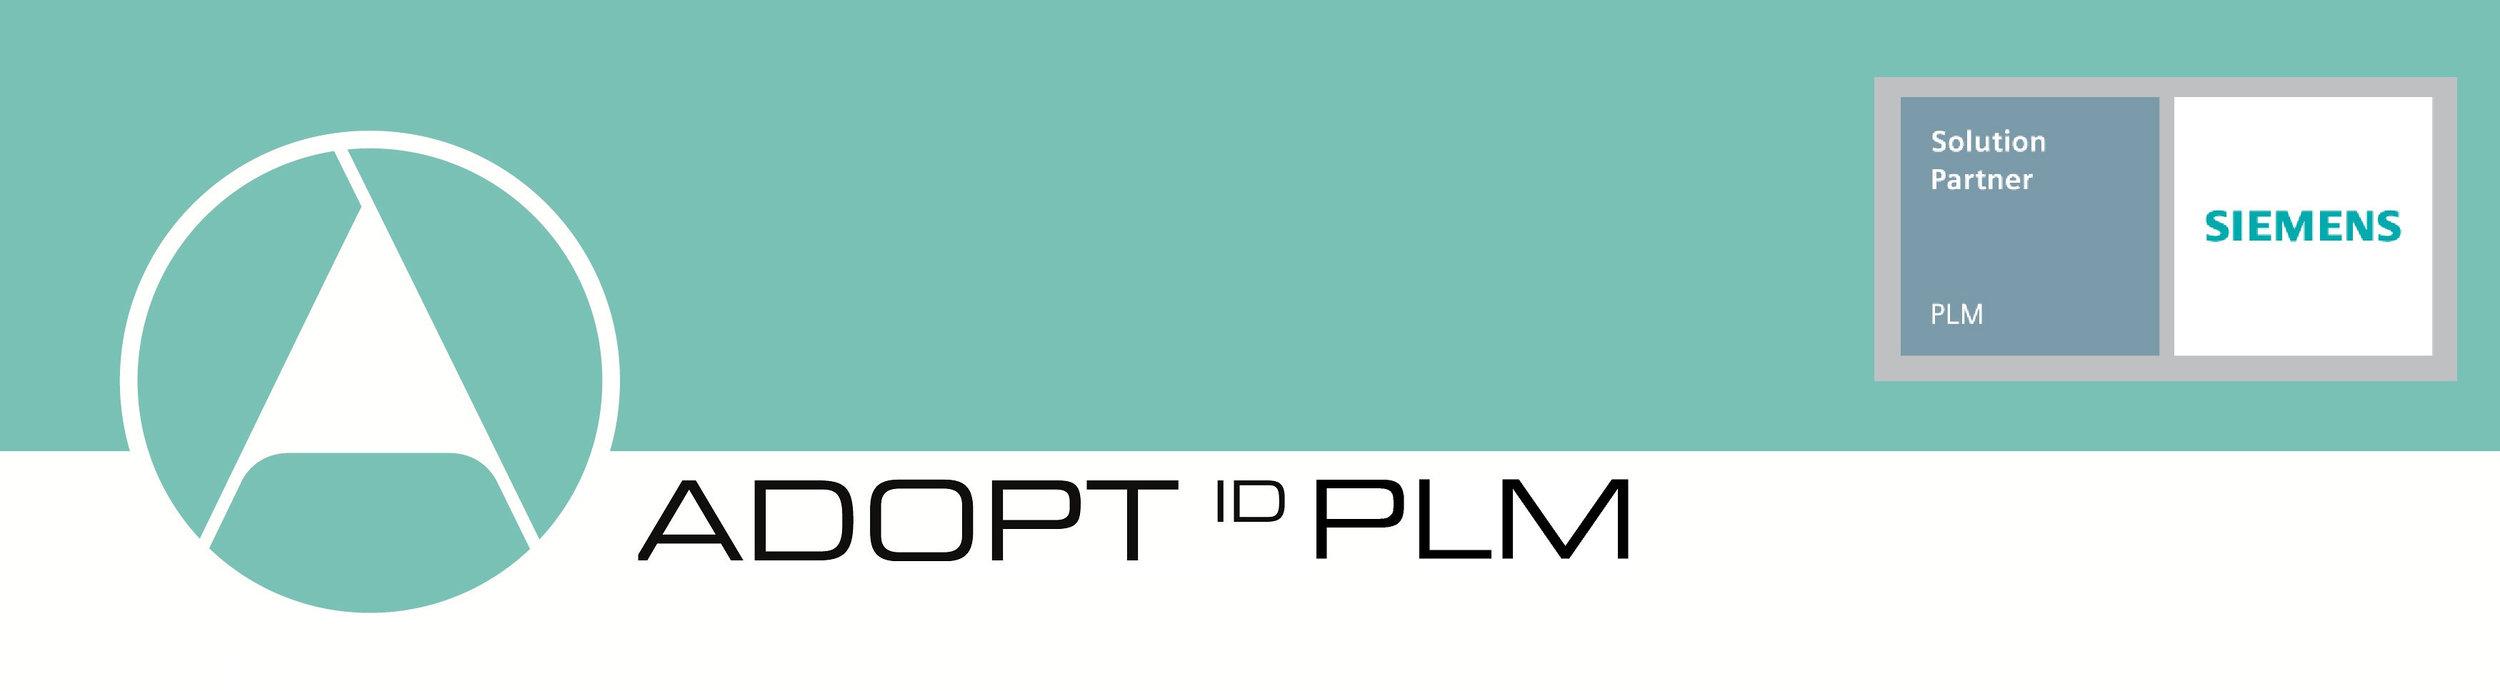 ADOPT id PLM long Siemens.jpg